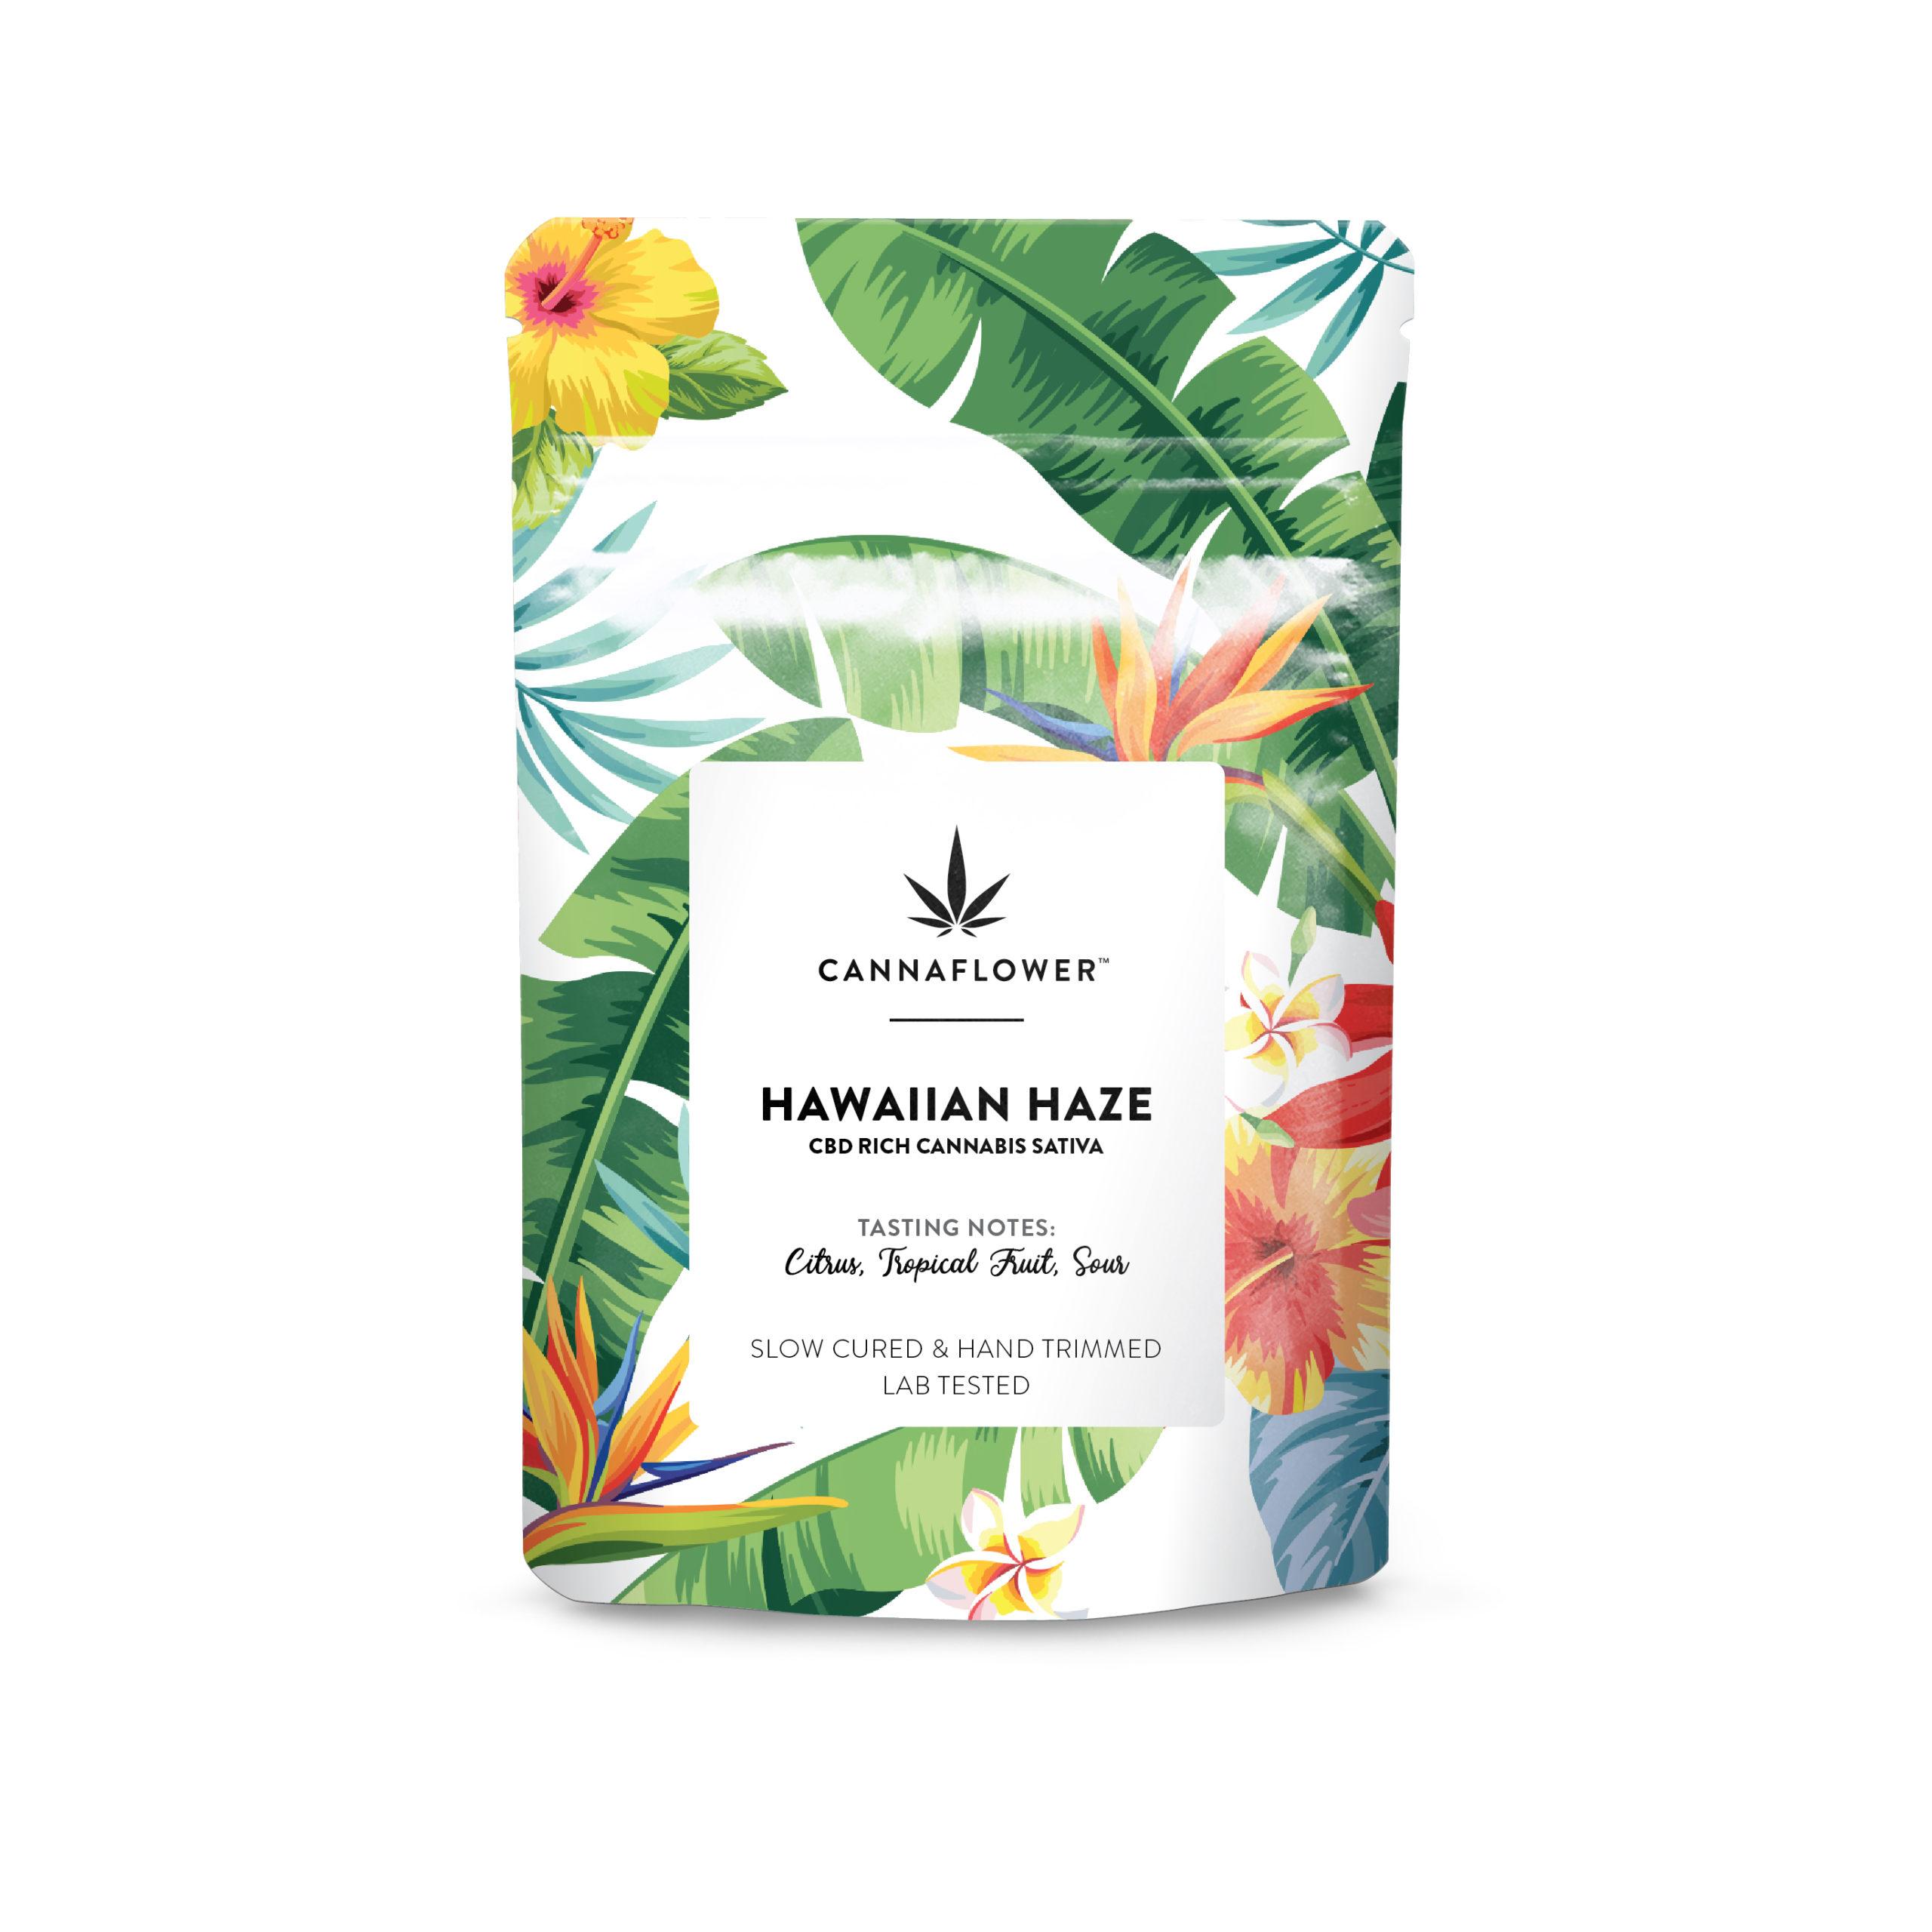 Hawaiian Haze CBD Hemp Flower - 1 gram